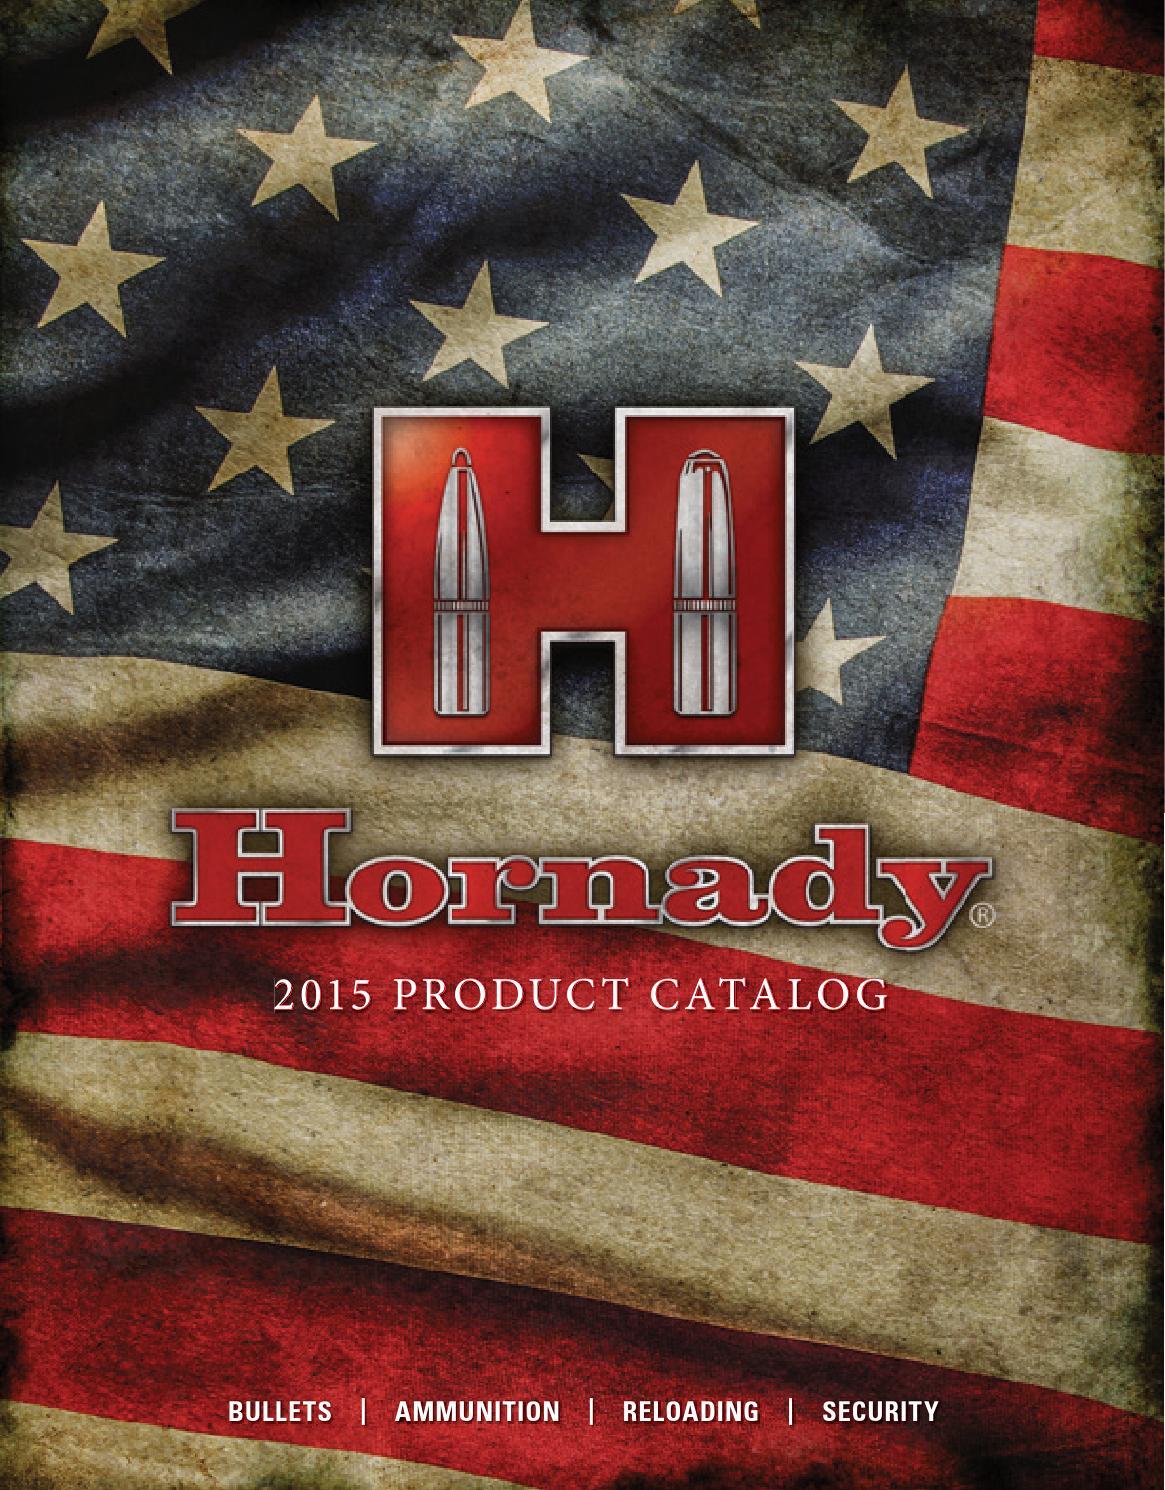 Hornady 546365 DIESET 2 300 REM ULTRA MAG Remington Custom Grade Reloading...